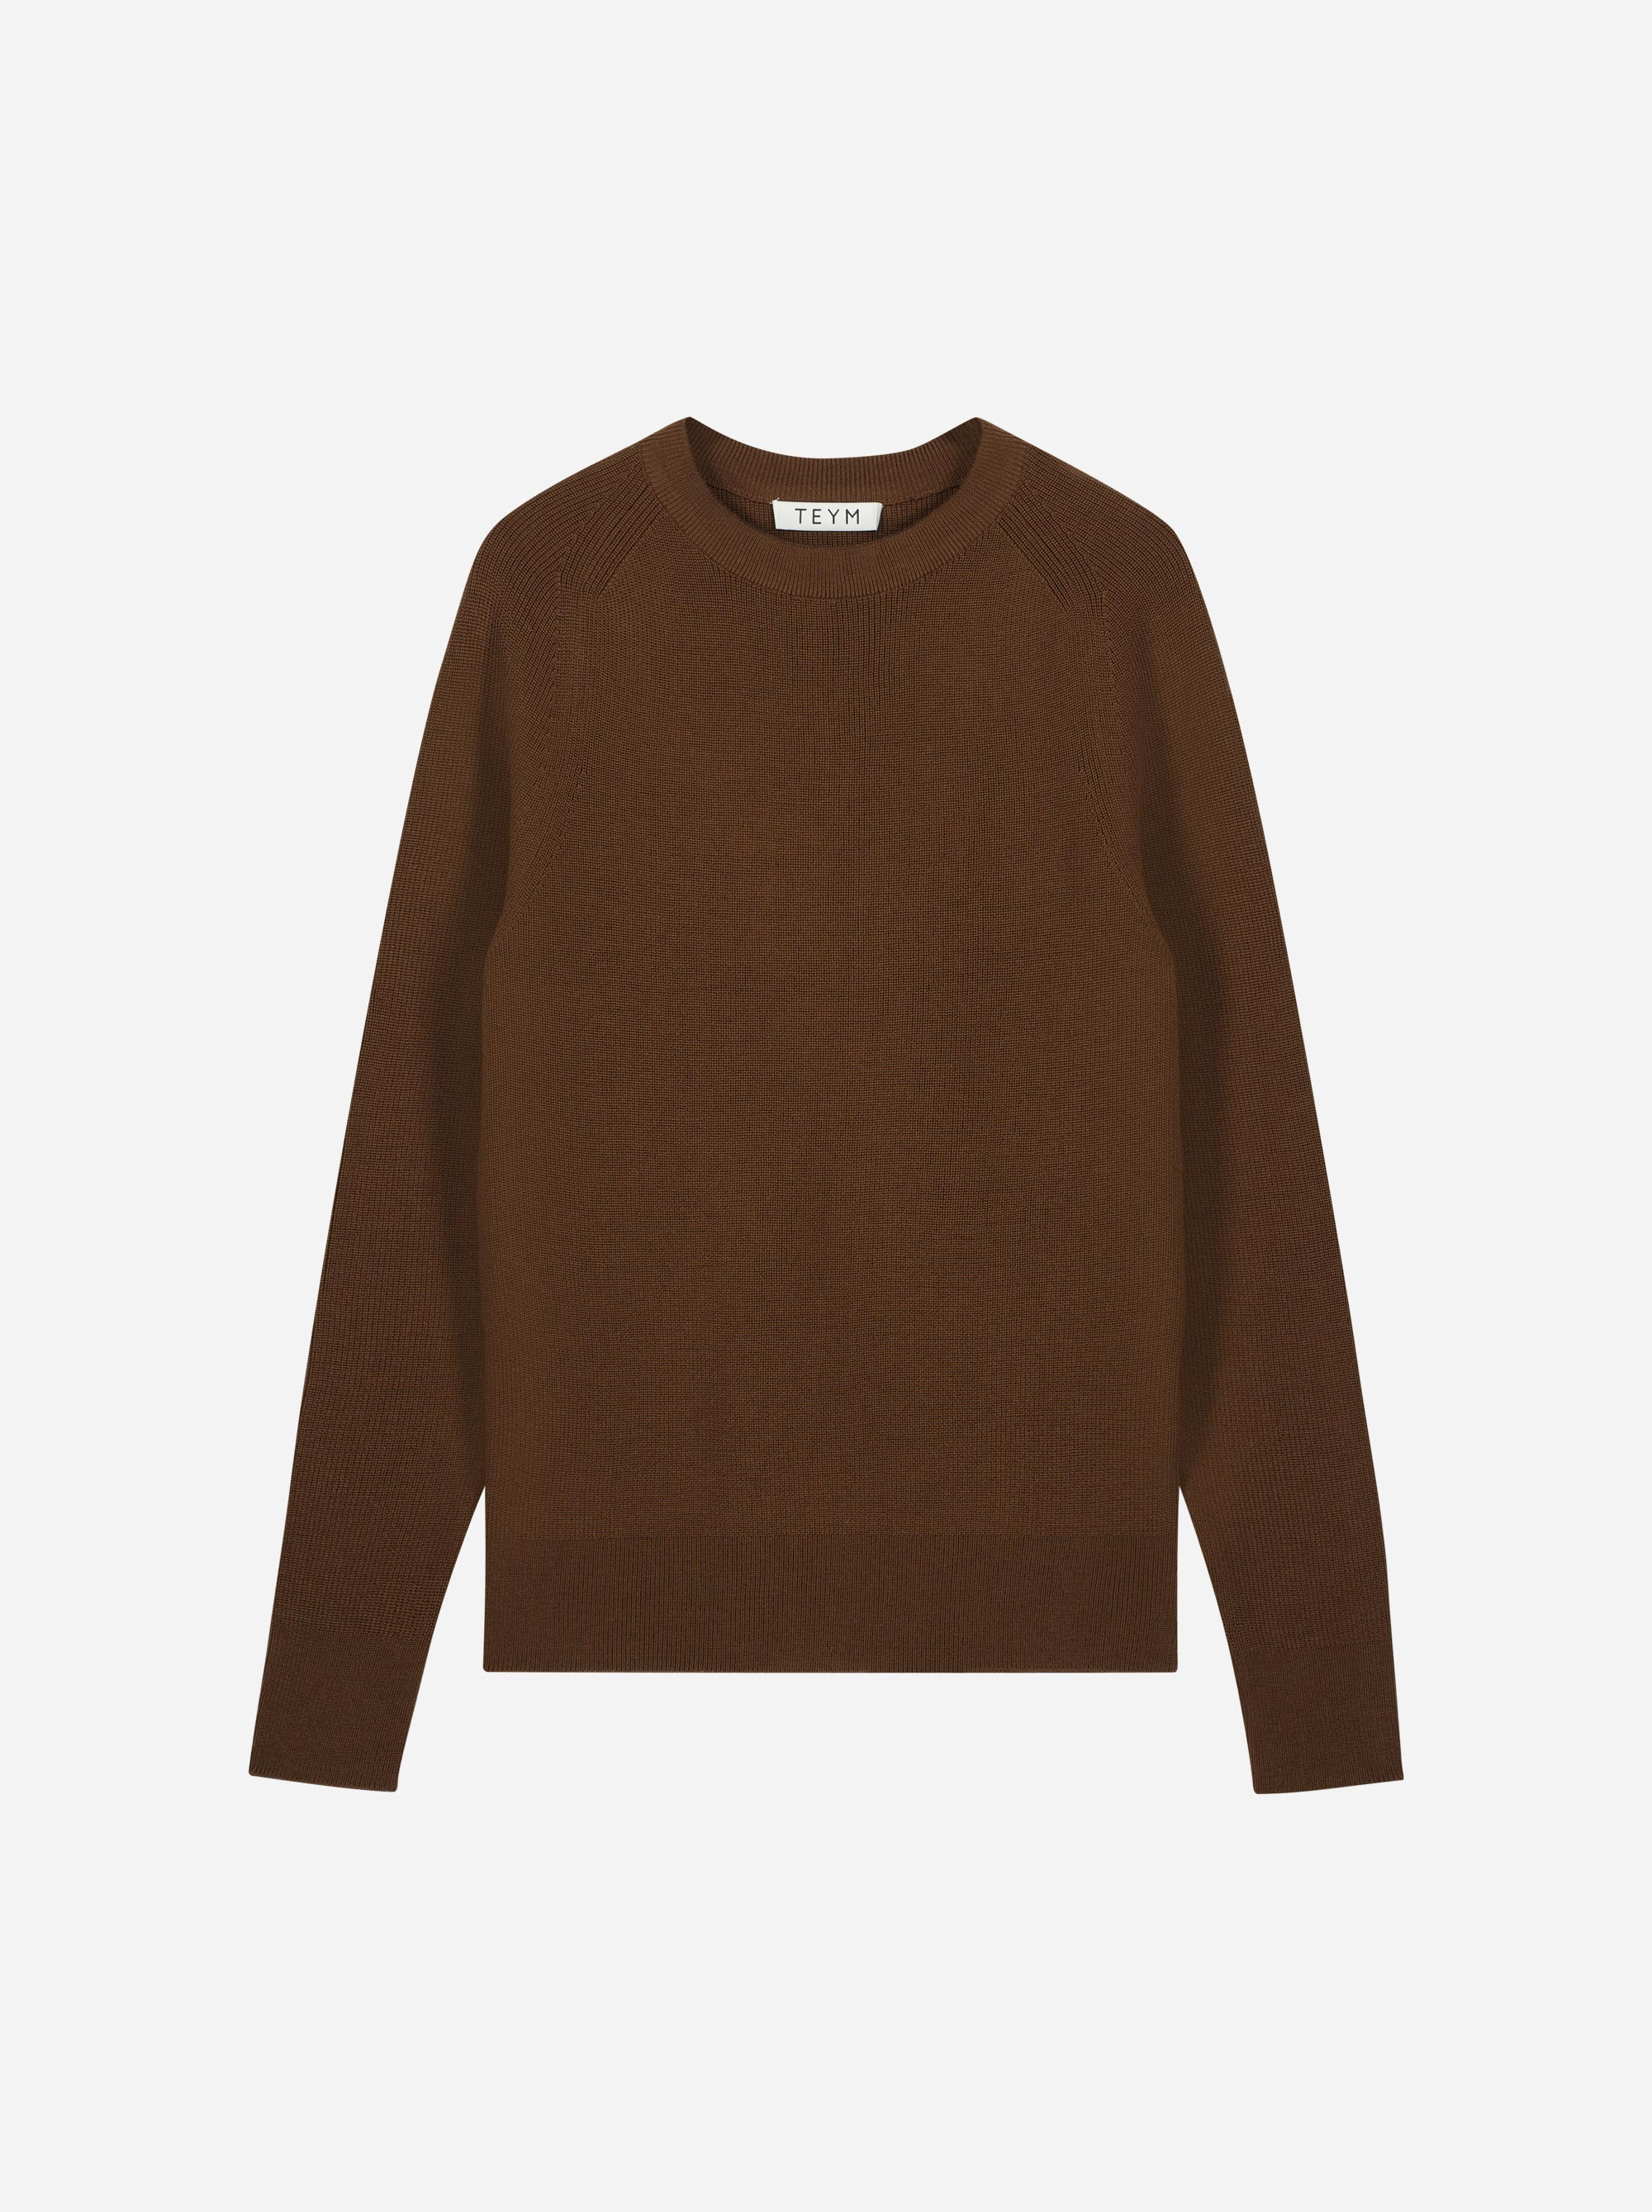 Teym_Merino-Sweater-Crewneck_Dark_Brown_front_1